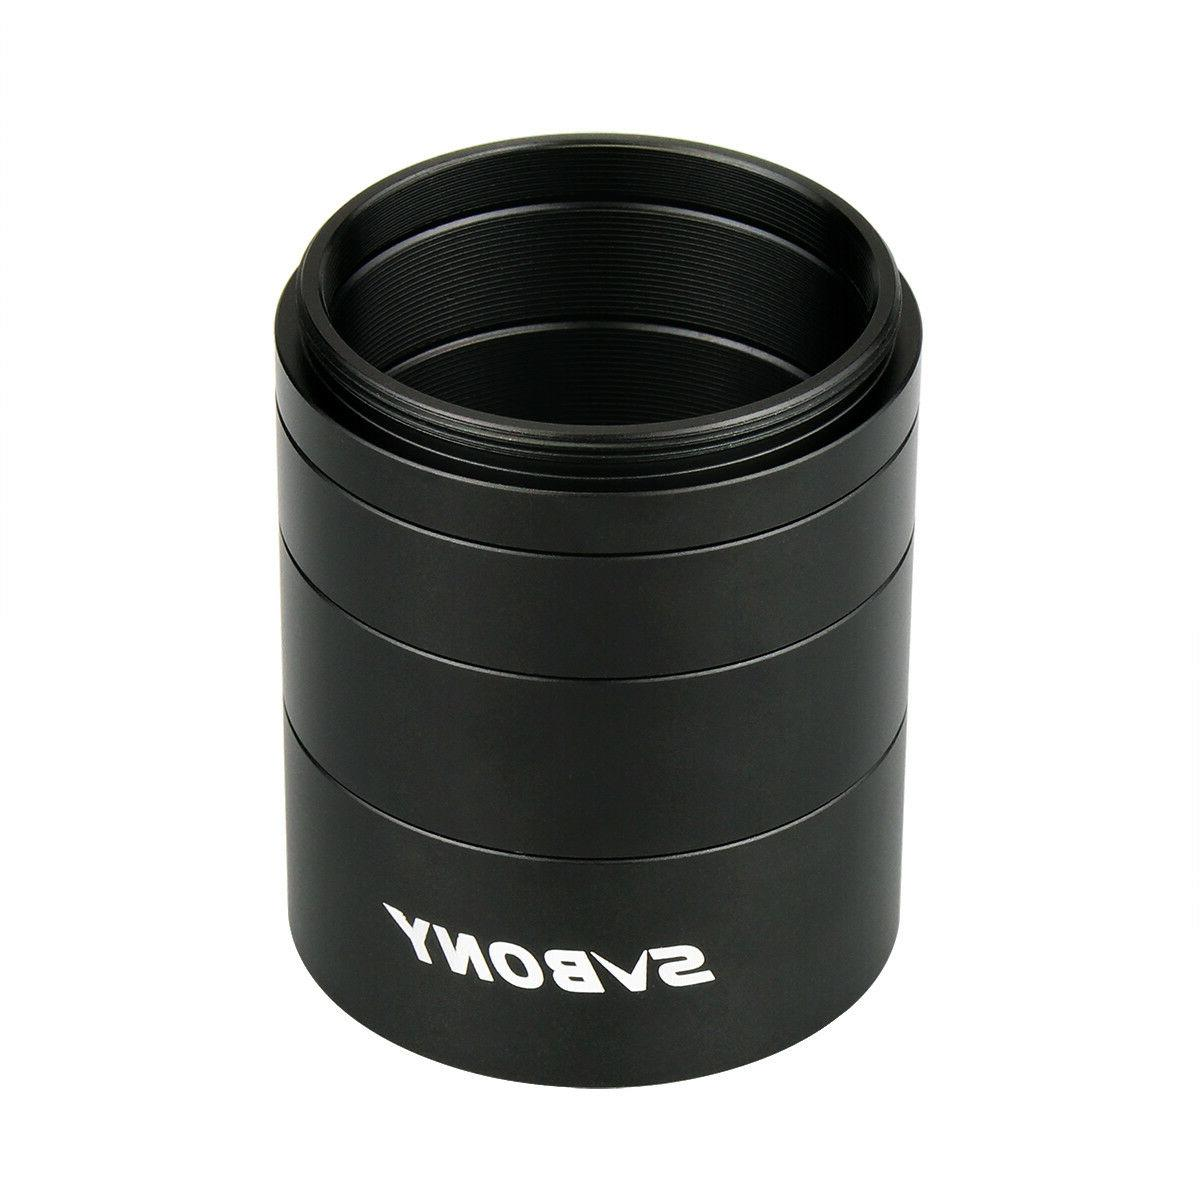 SVBONY T2 Tube Kits Length 5mm 10mm 20mm US